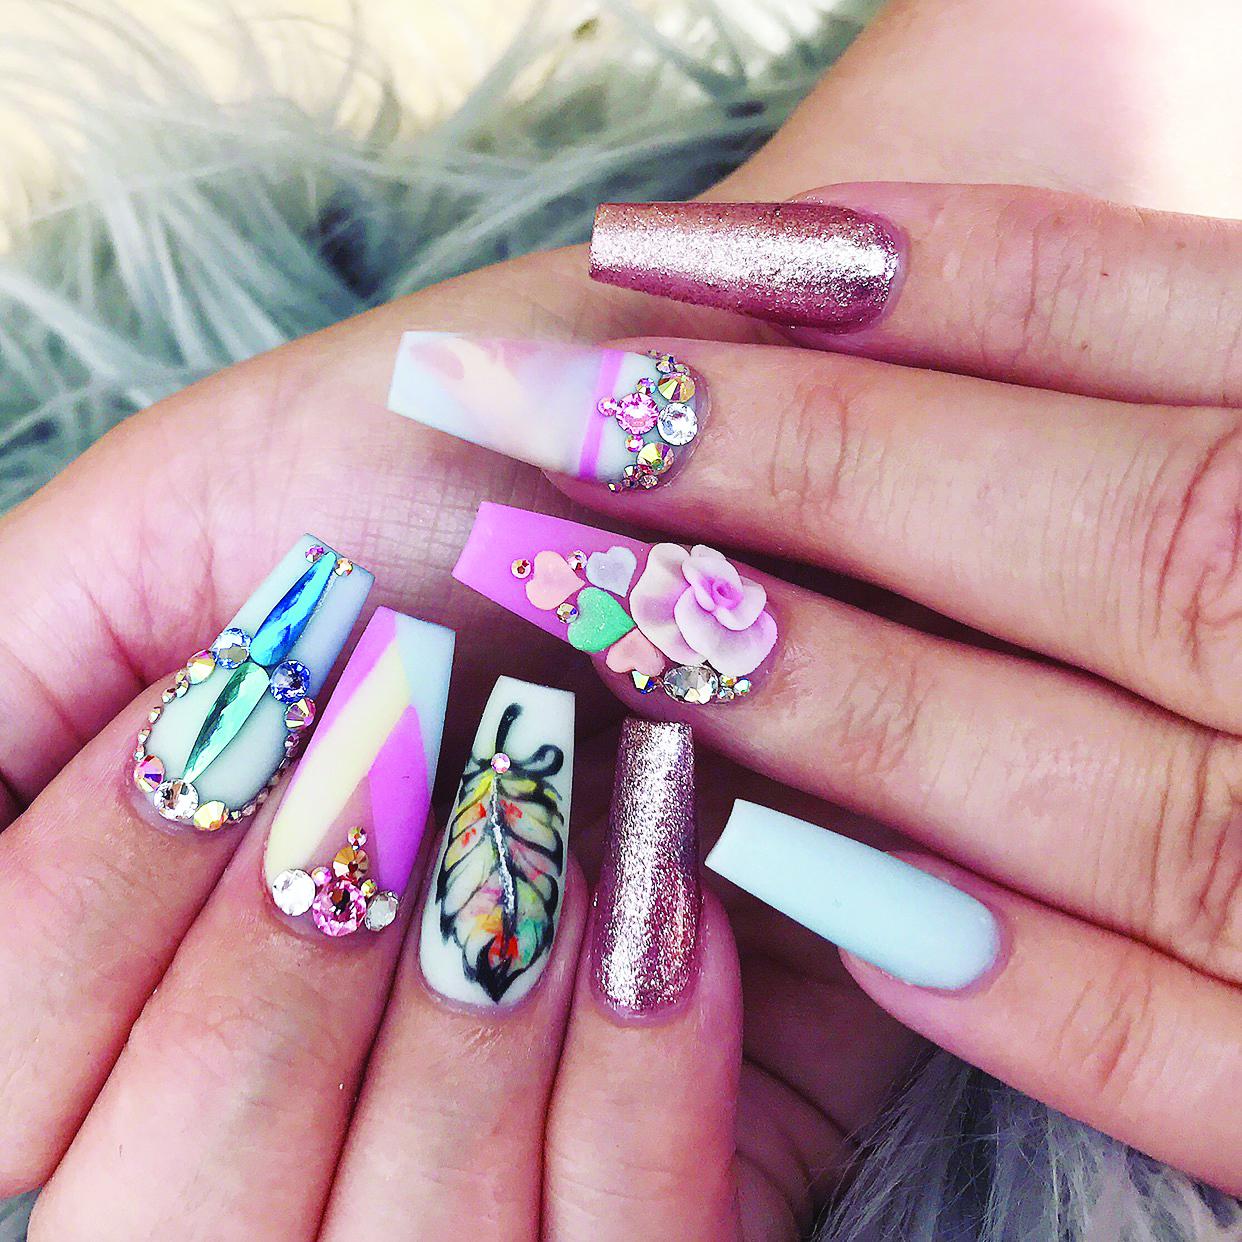 The Art of Acrylic Nail Art Designs